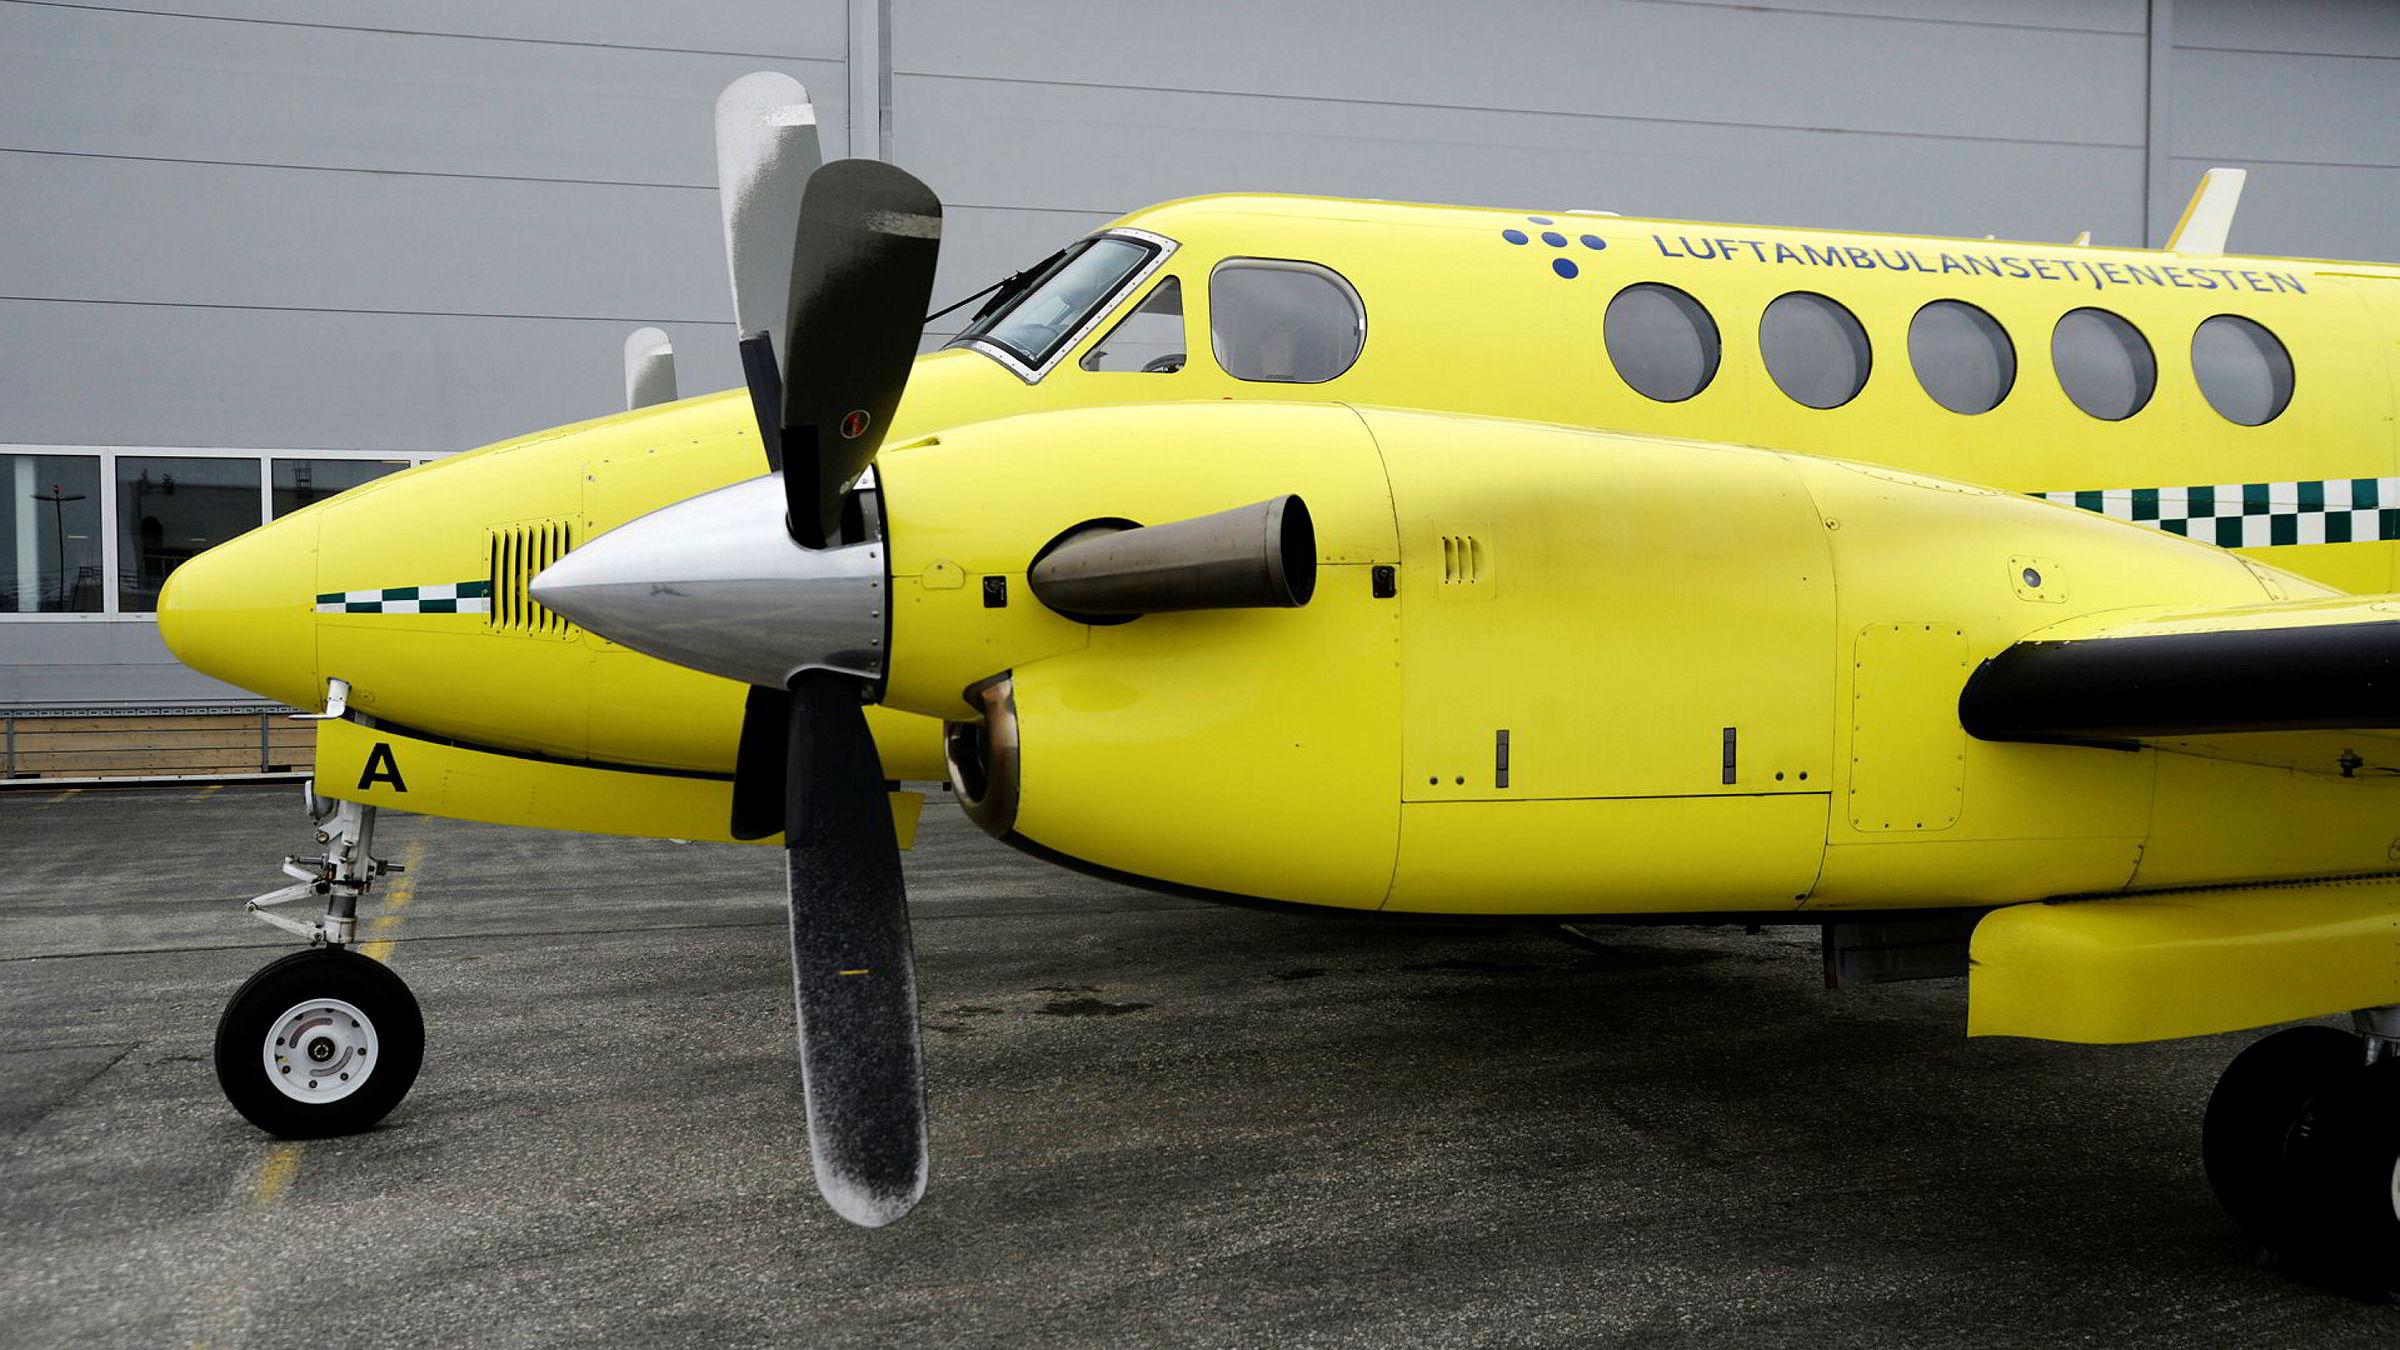 Luftambulansefly fra Lufttransport på Tromsø Lufthavn. Foto: Rune Stoltz Bertinussen / NTB scanpix